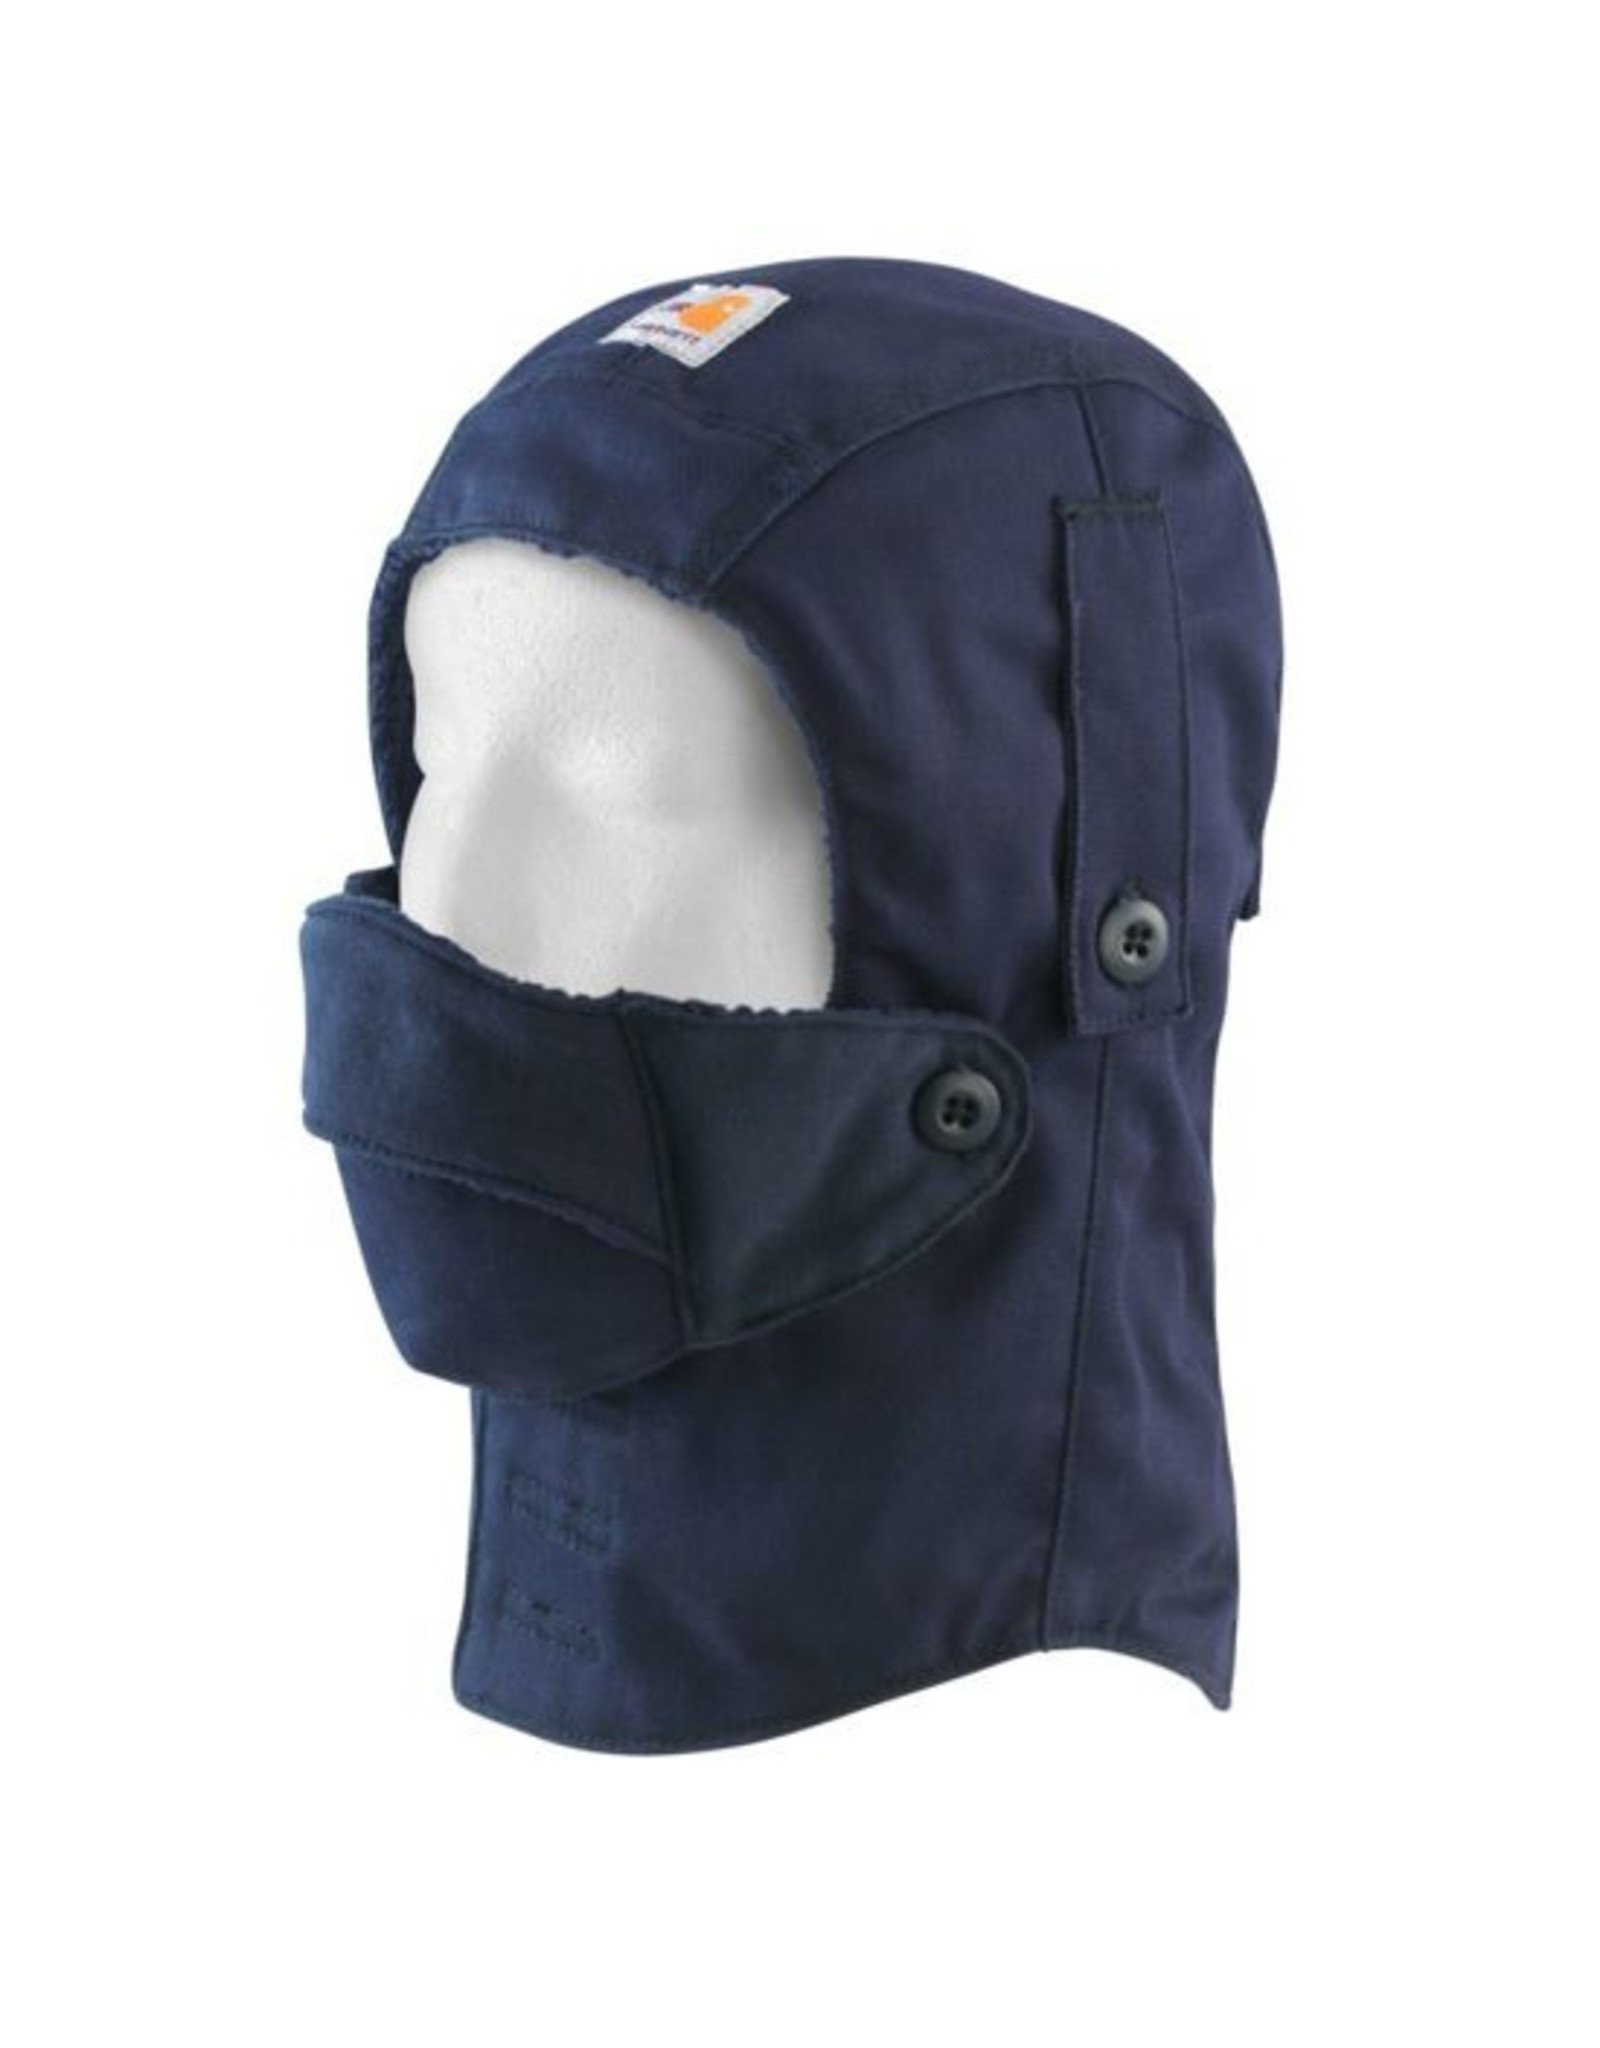 Carhartt Flame-Resistant Rain Defender Hat Liner - Navy